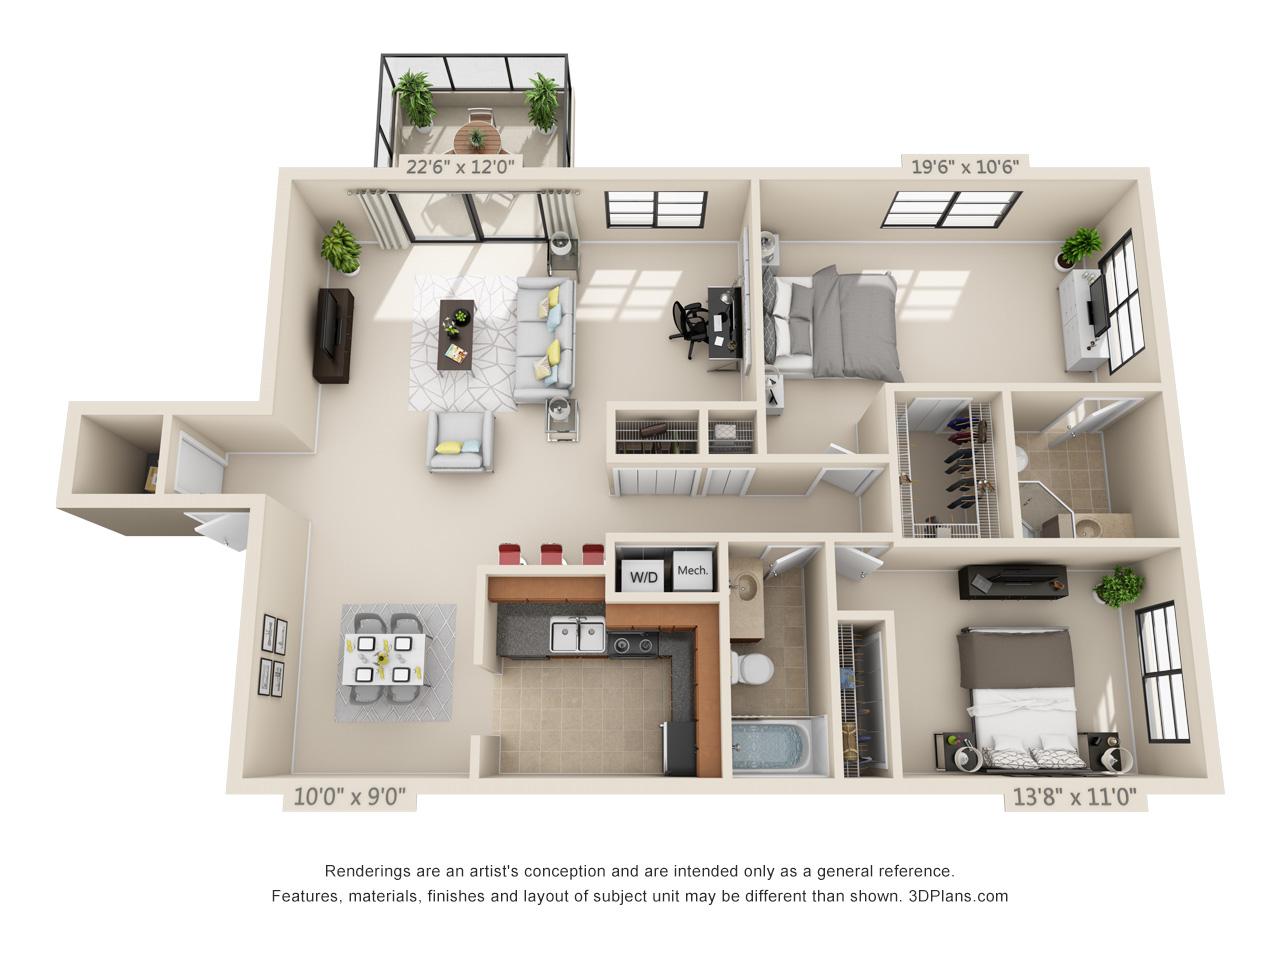 boca raton apartment rentals. Boca Raton Apartments   Apartments In Boca Raton FL   Crystal Palms